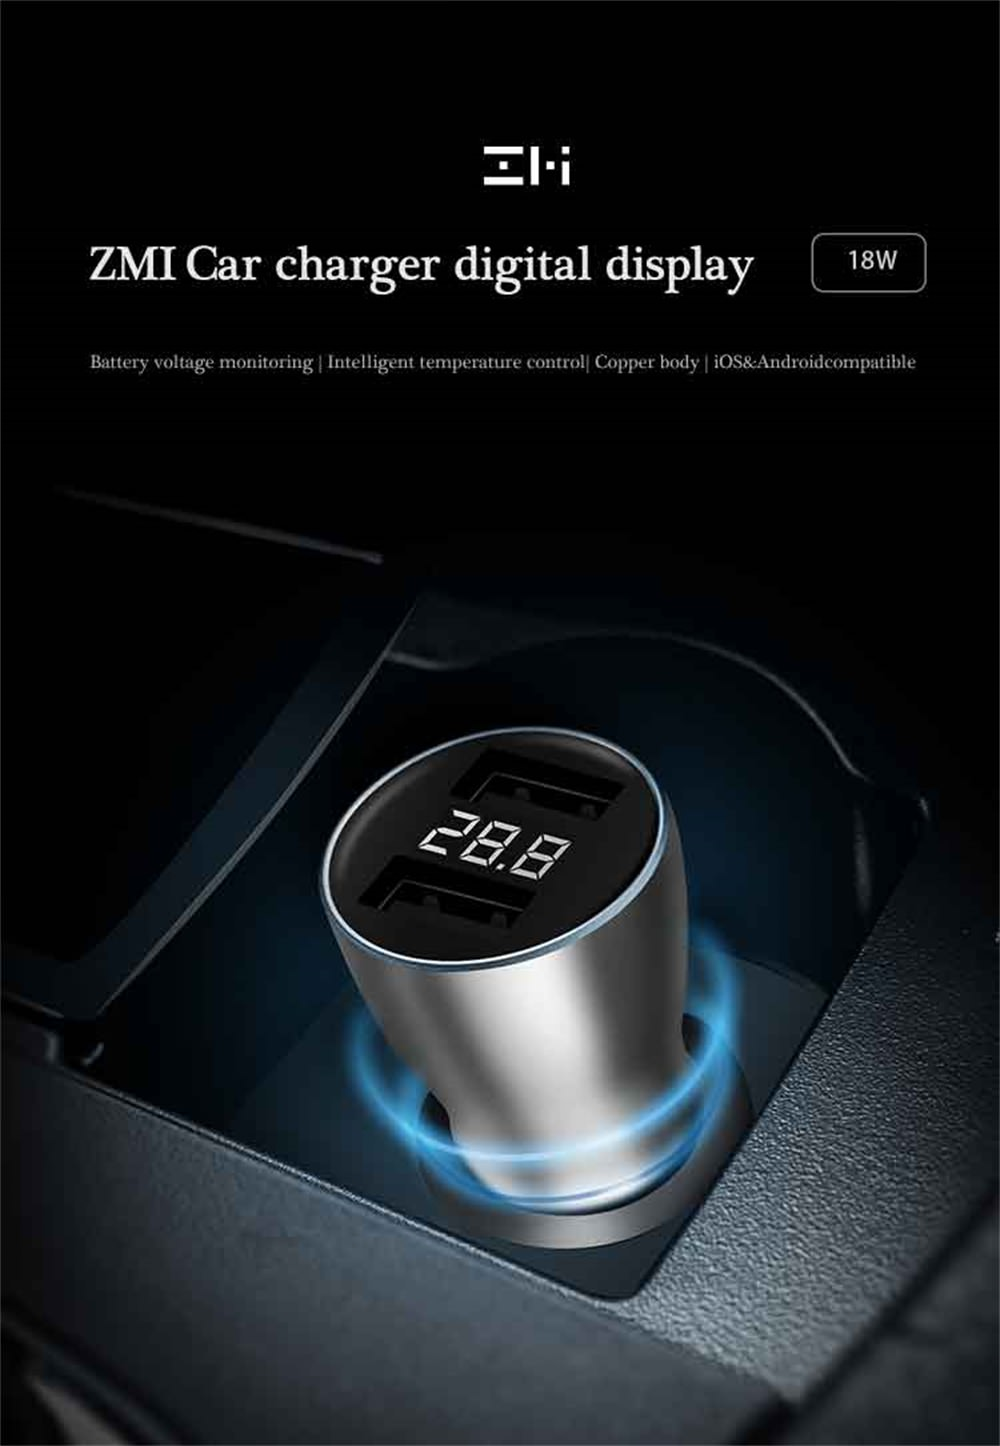 xiaomi zmi car charger online